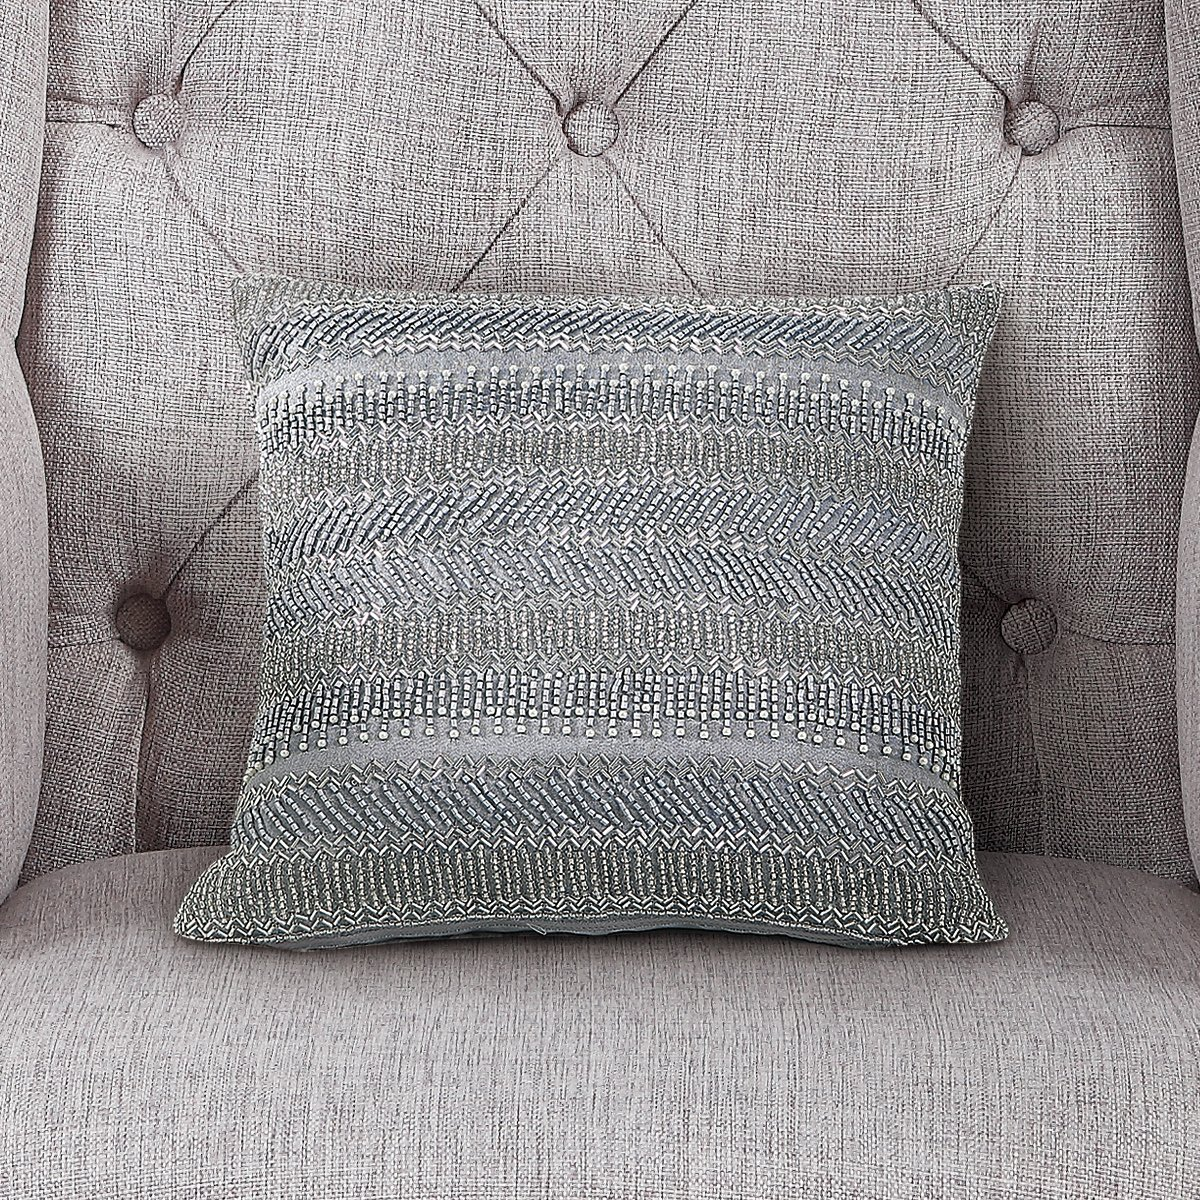 80 x 60 Fleece Blanket Kess InHouse Anne Labrie Davids Starry Sky Blue Pattern Throw